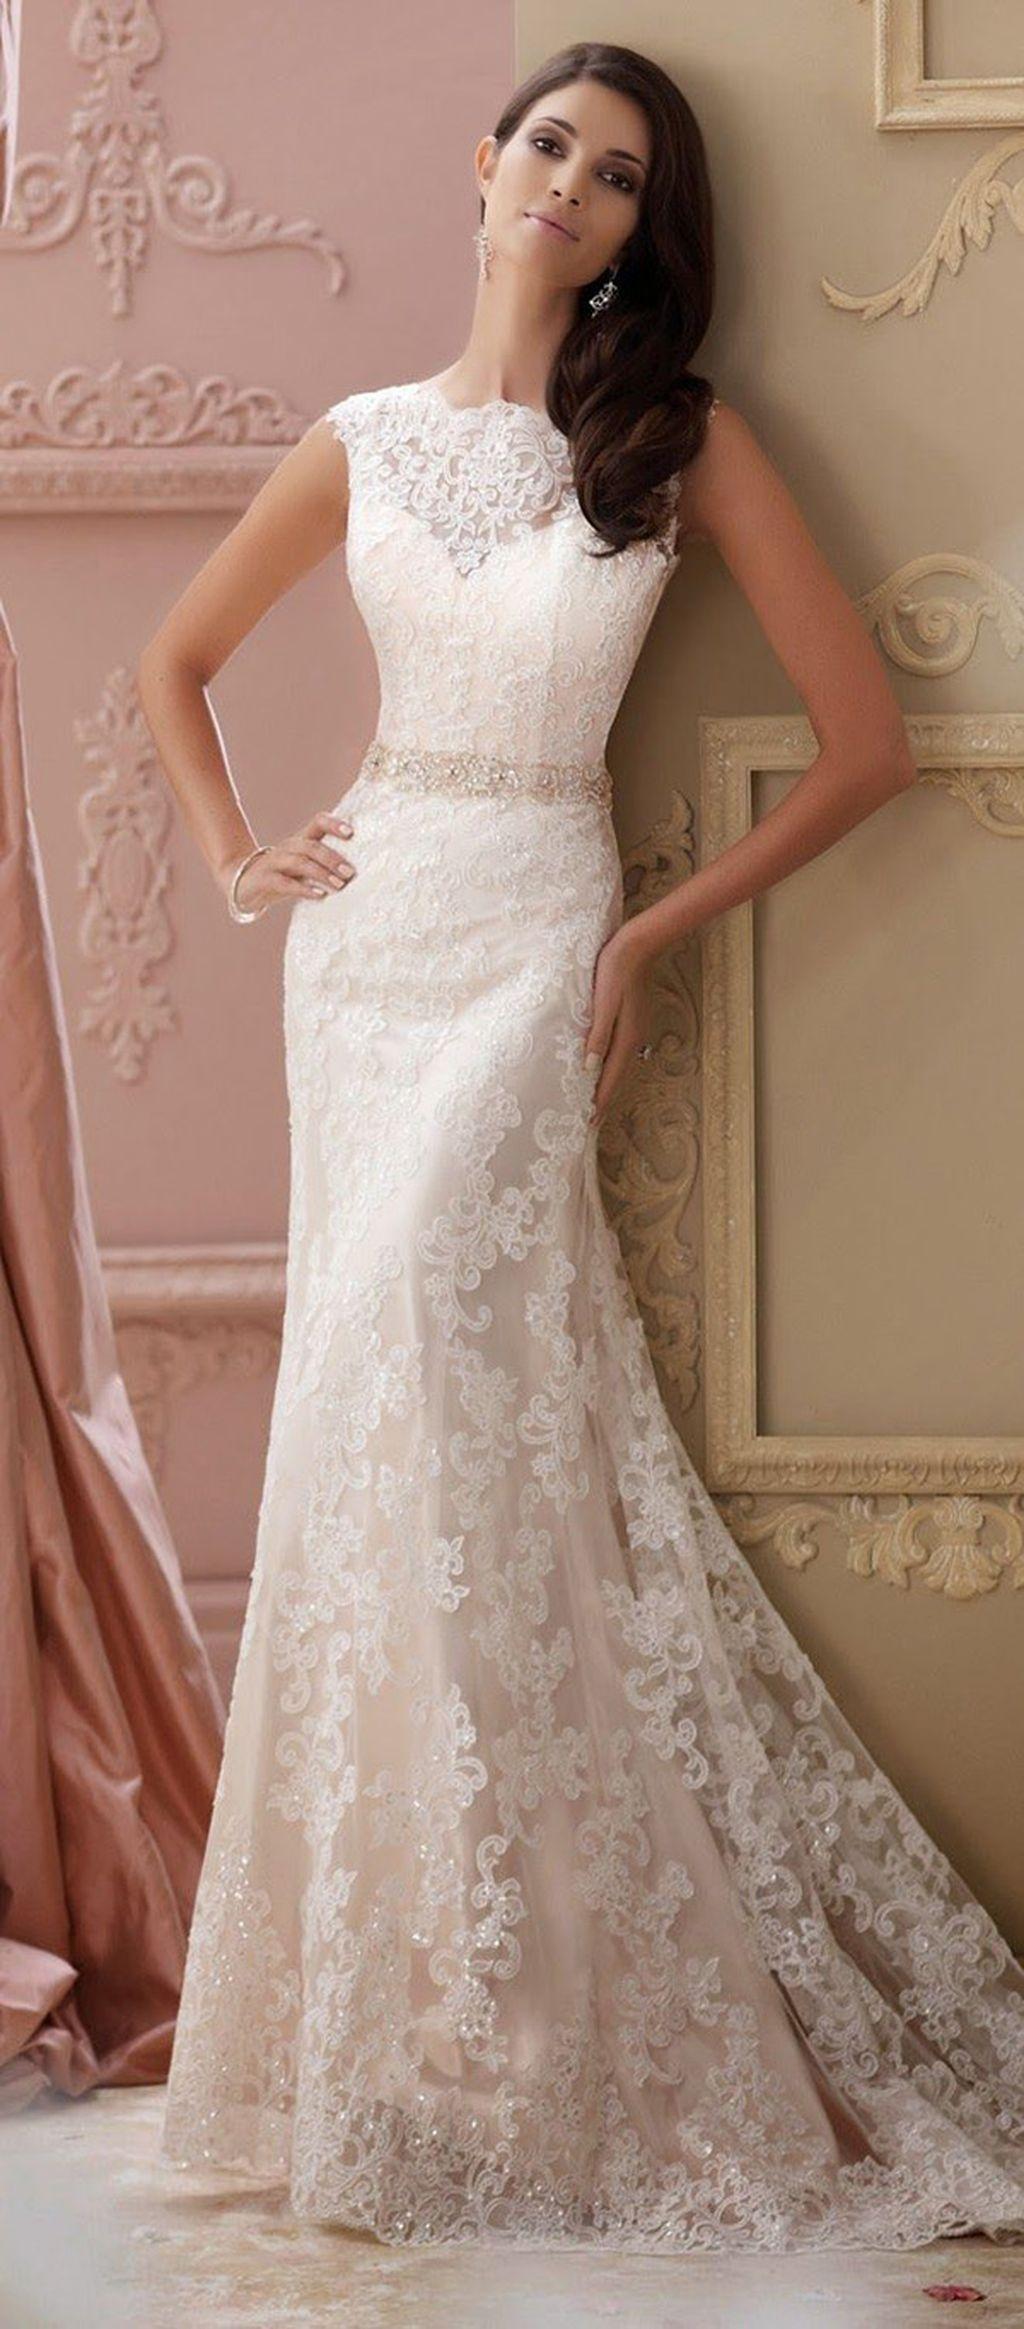 simple but elegant vintage white wedding dress ideas pinterest